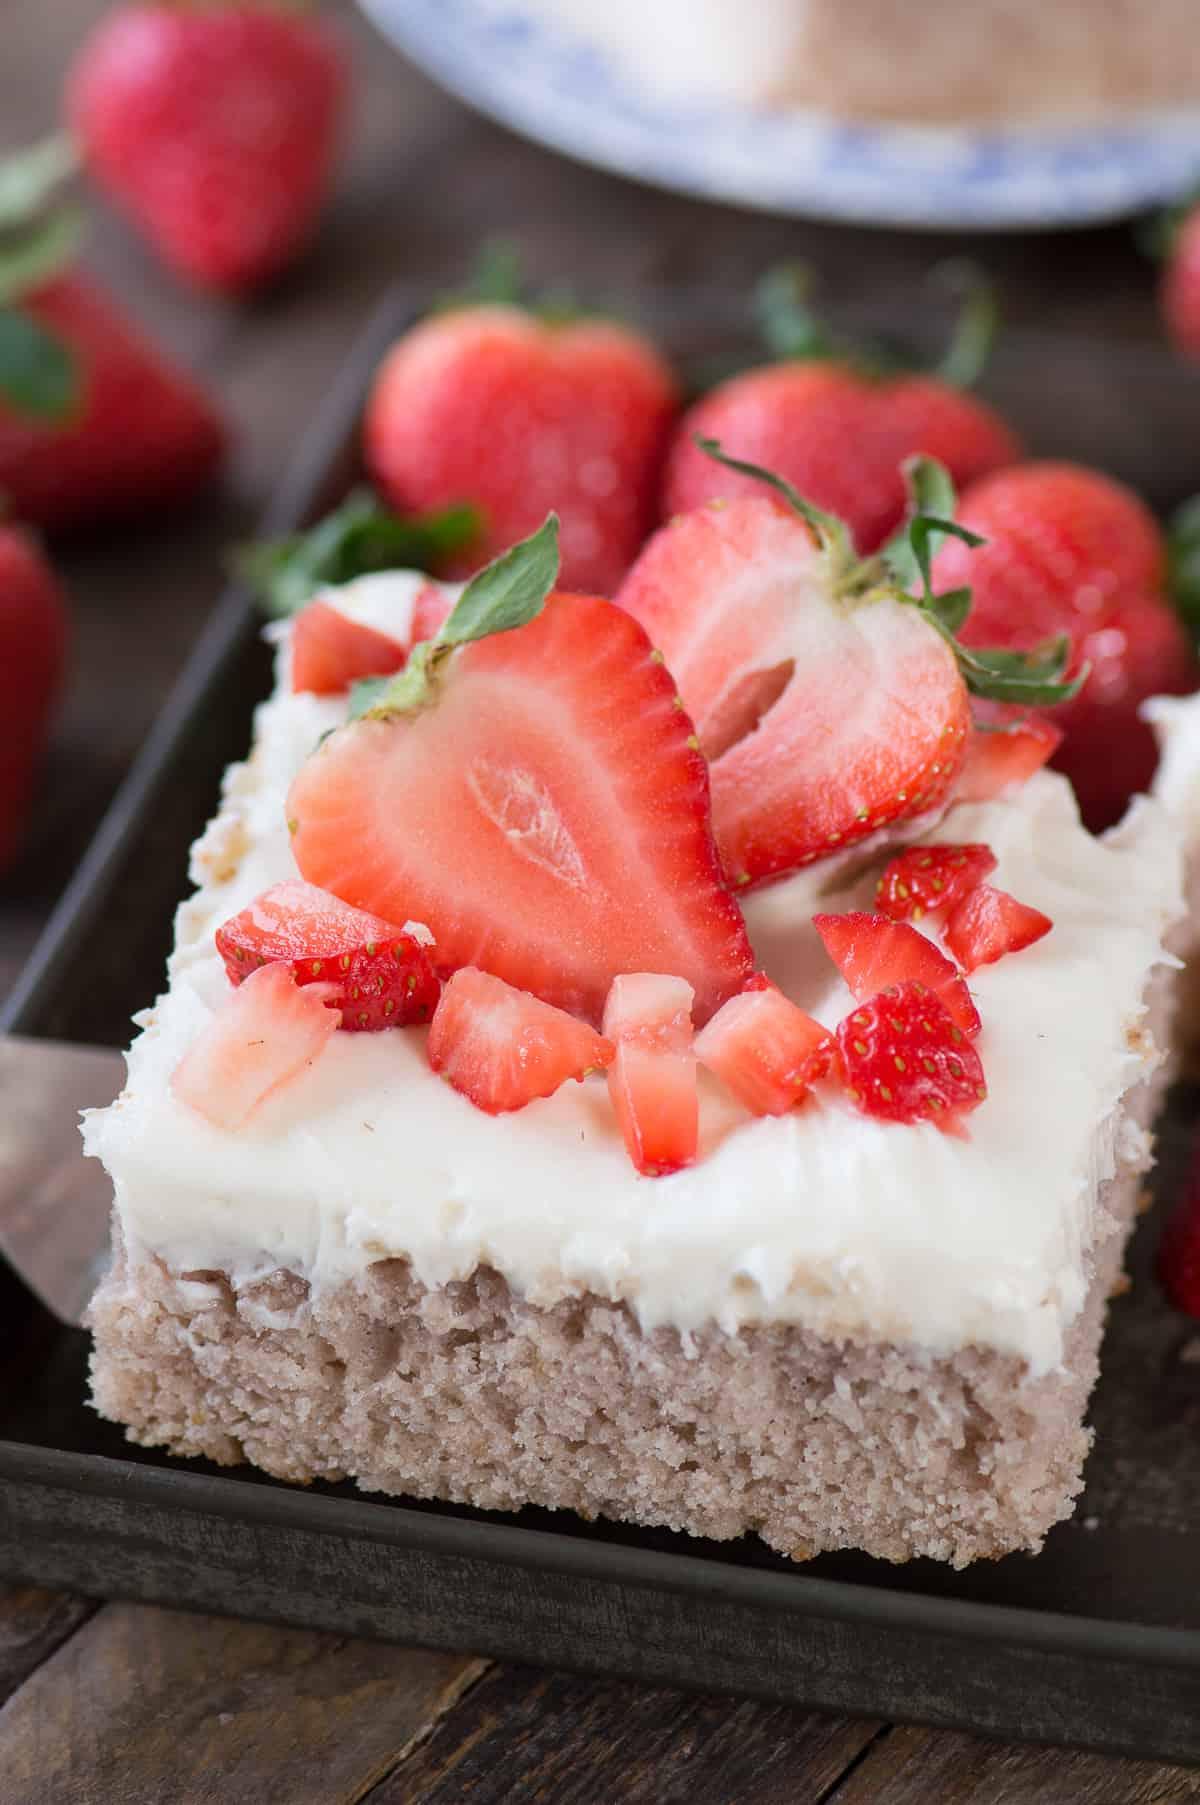 9x13 Inch Strawberry Cake